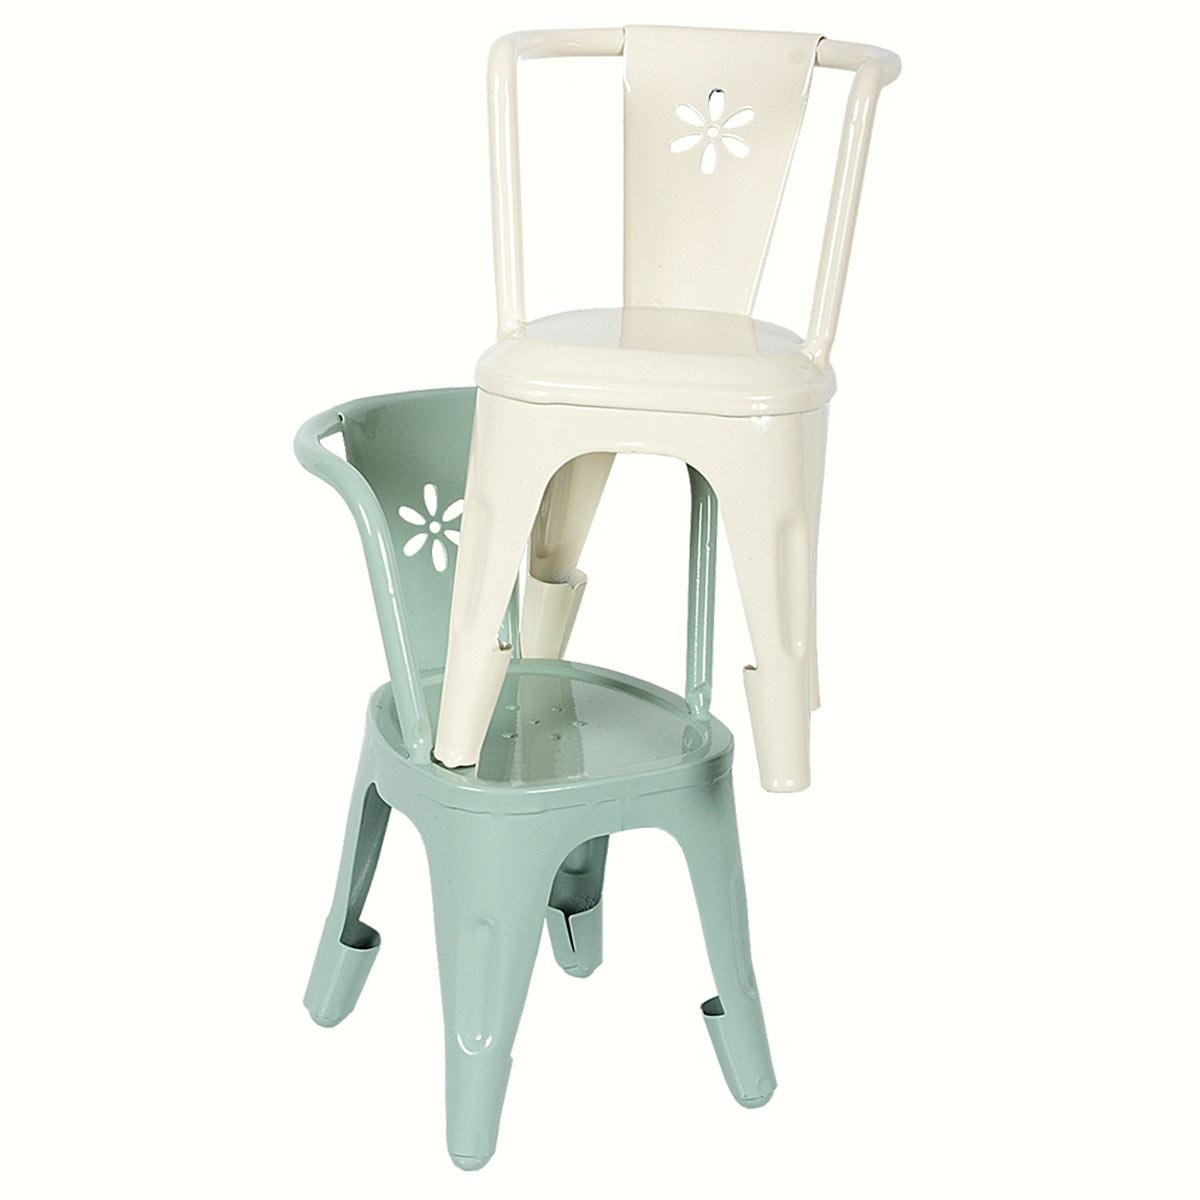 Künstlerisch Metall Stuhl Beste Wahl Maileg Möbel Metall-stuhl Weiss